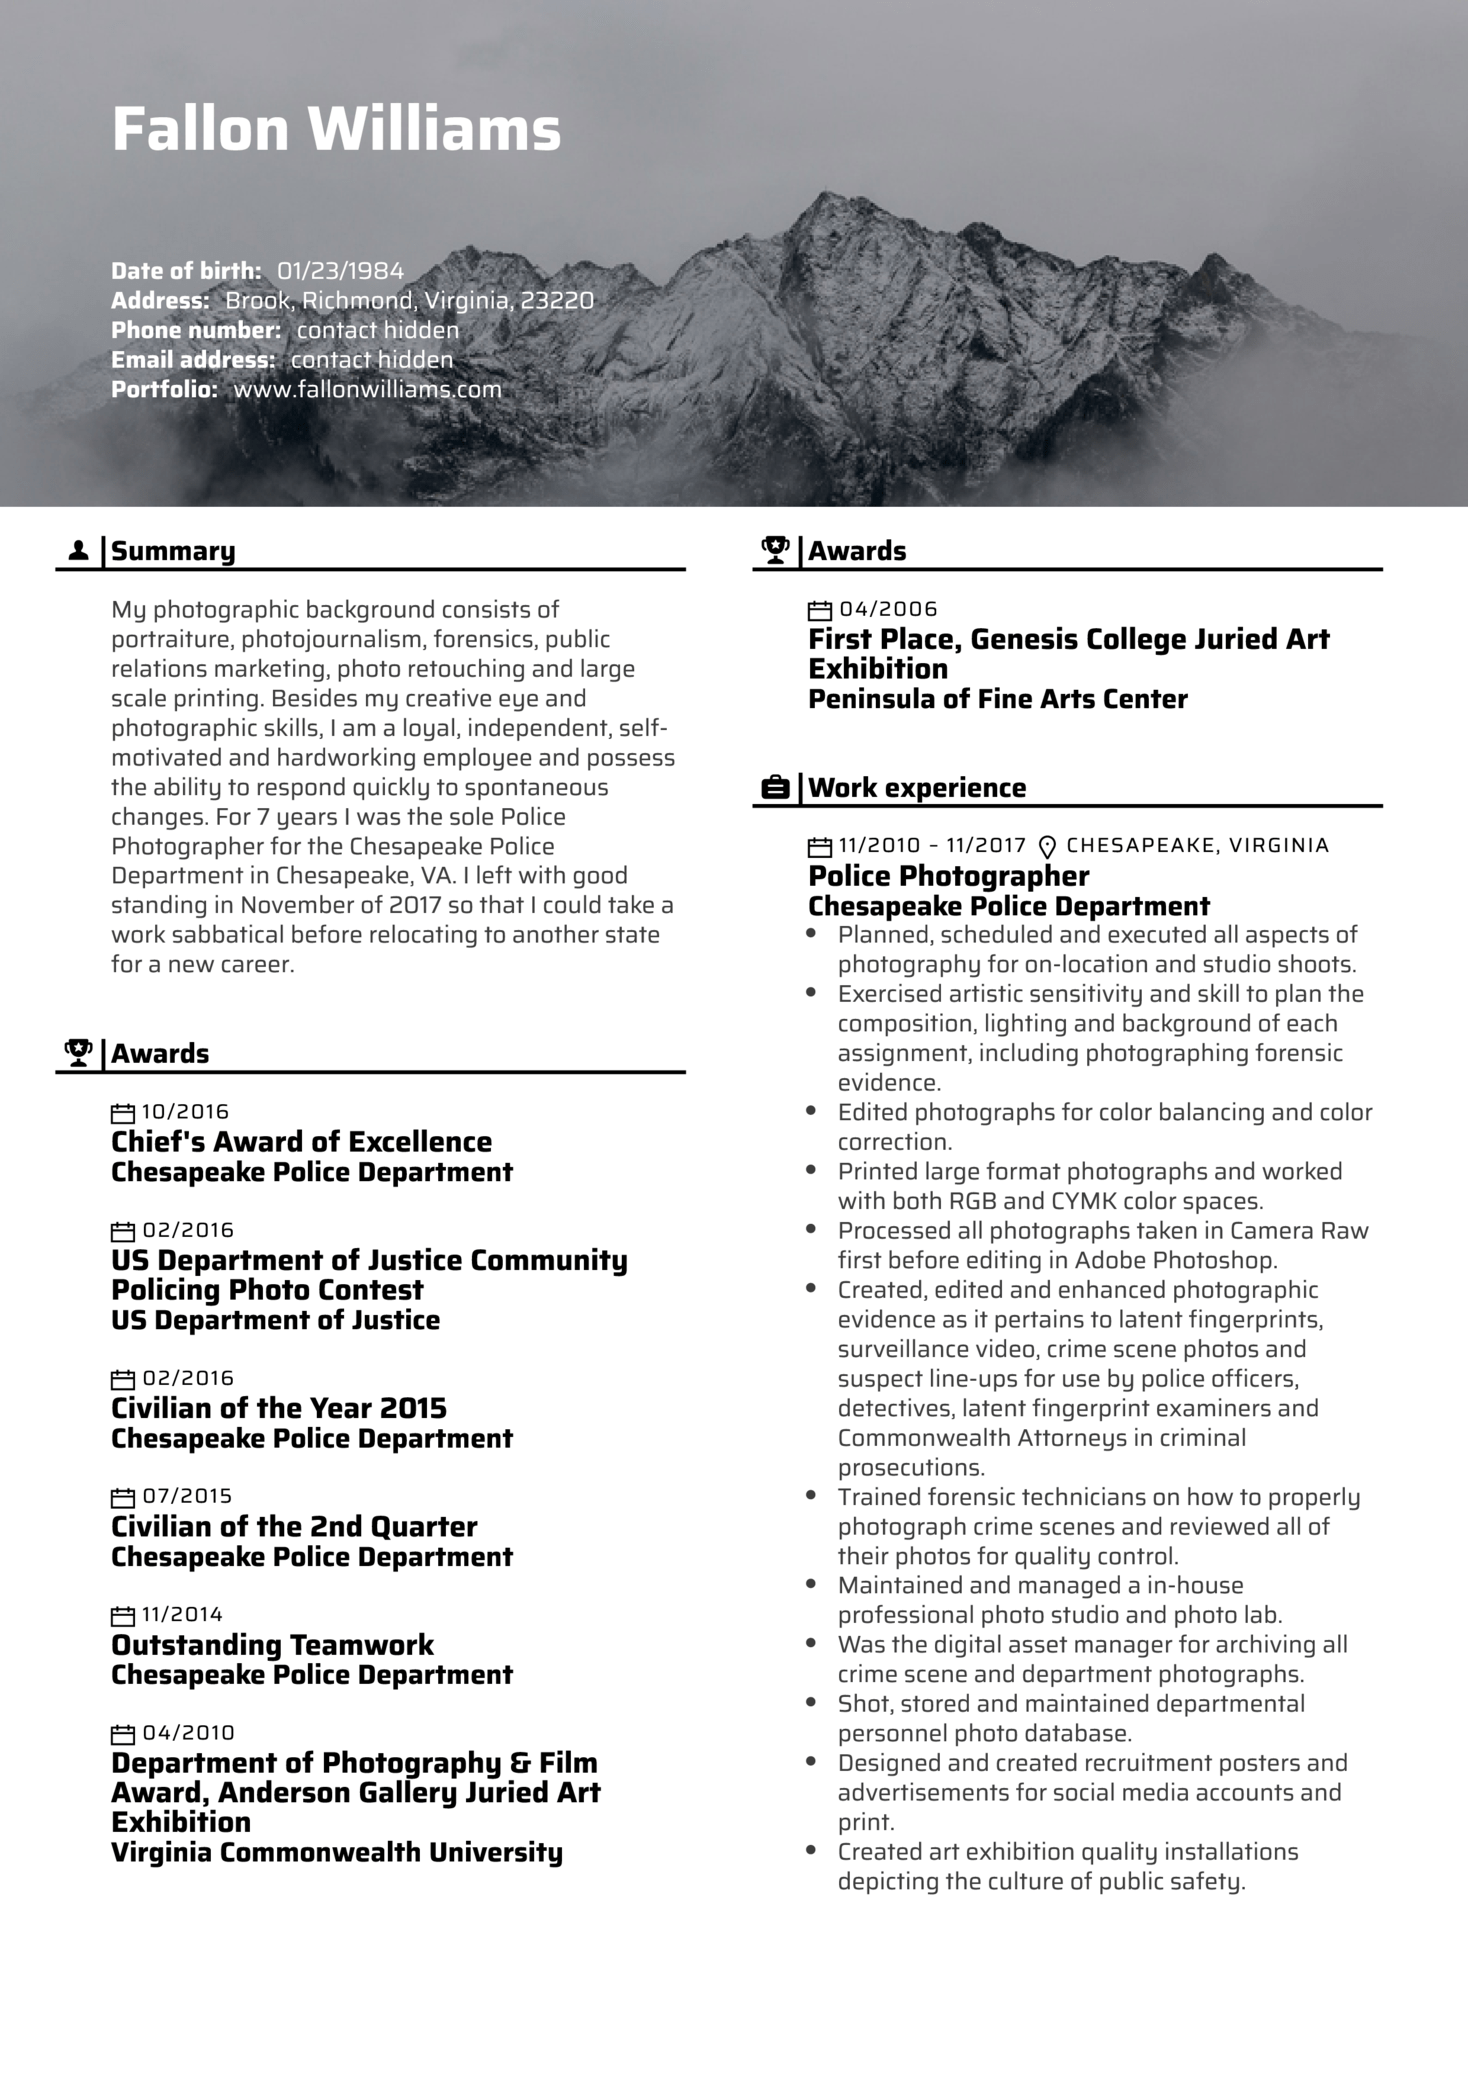 Photo Editor Resume Template (parte 1)